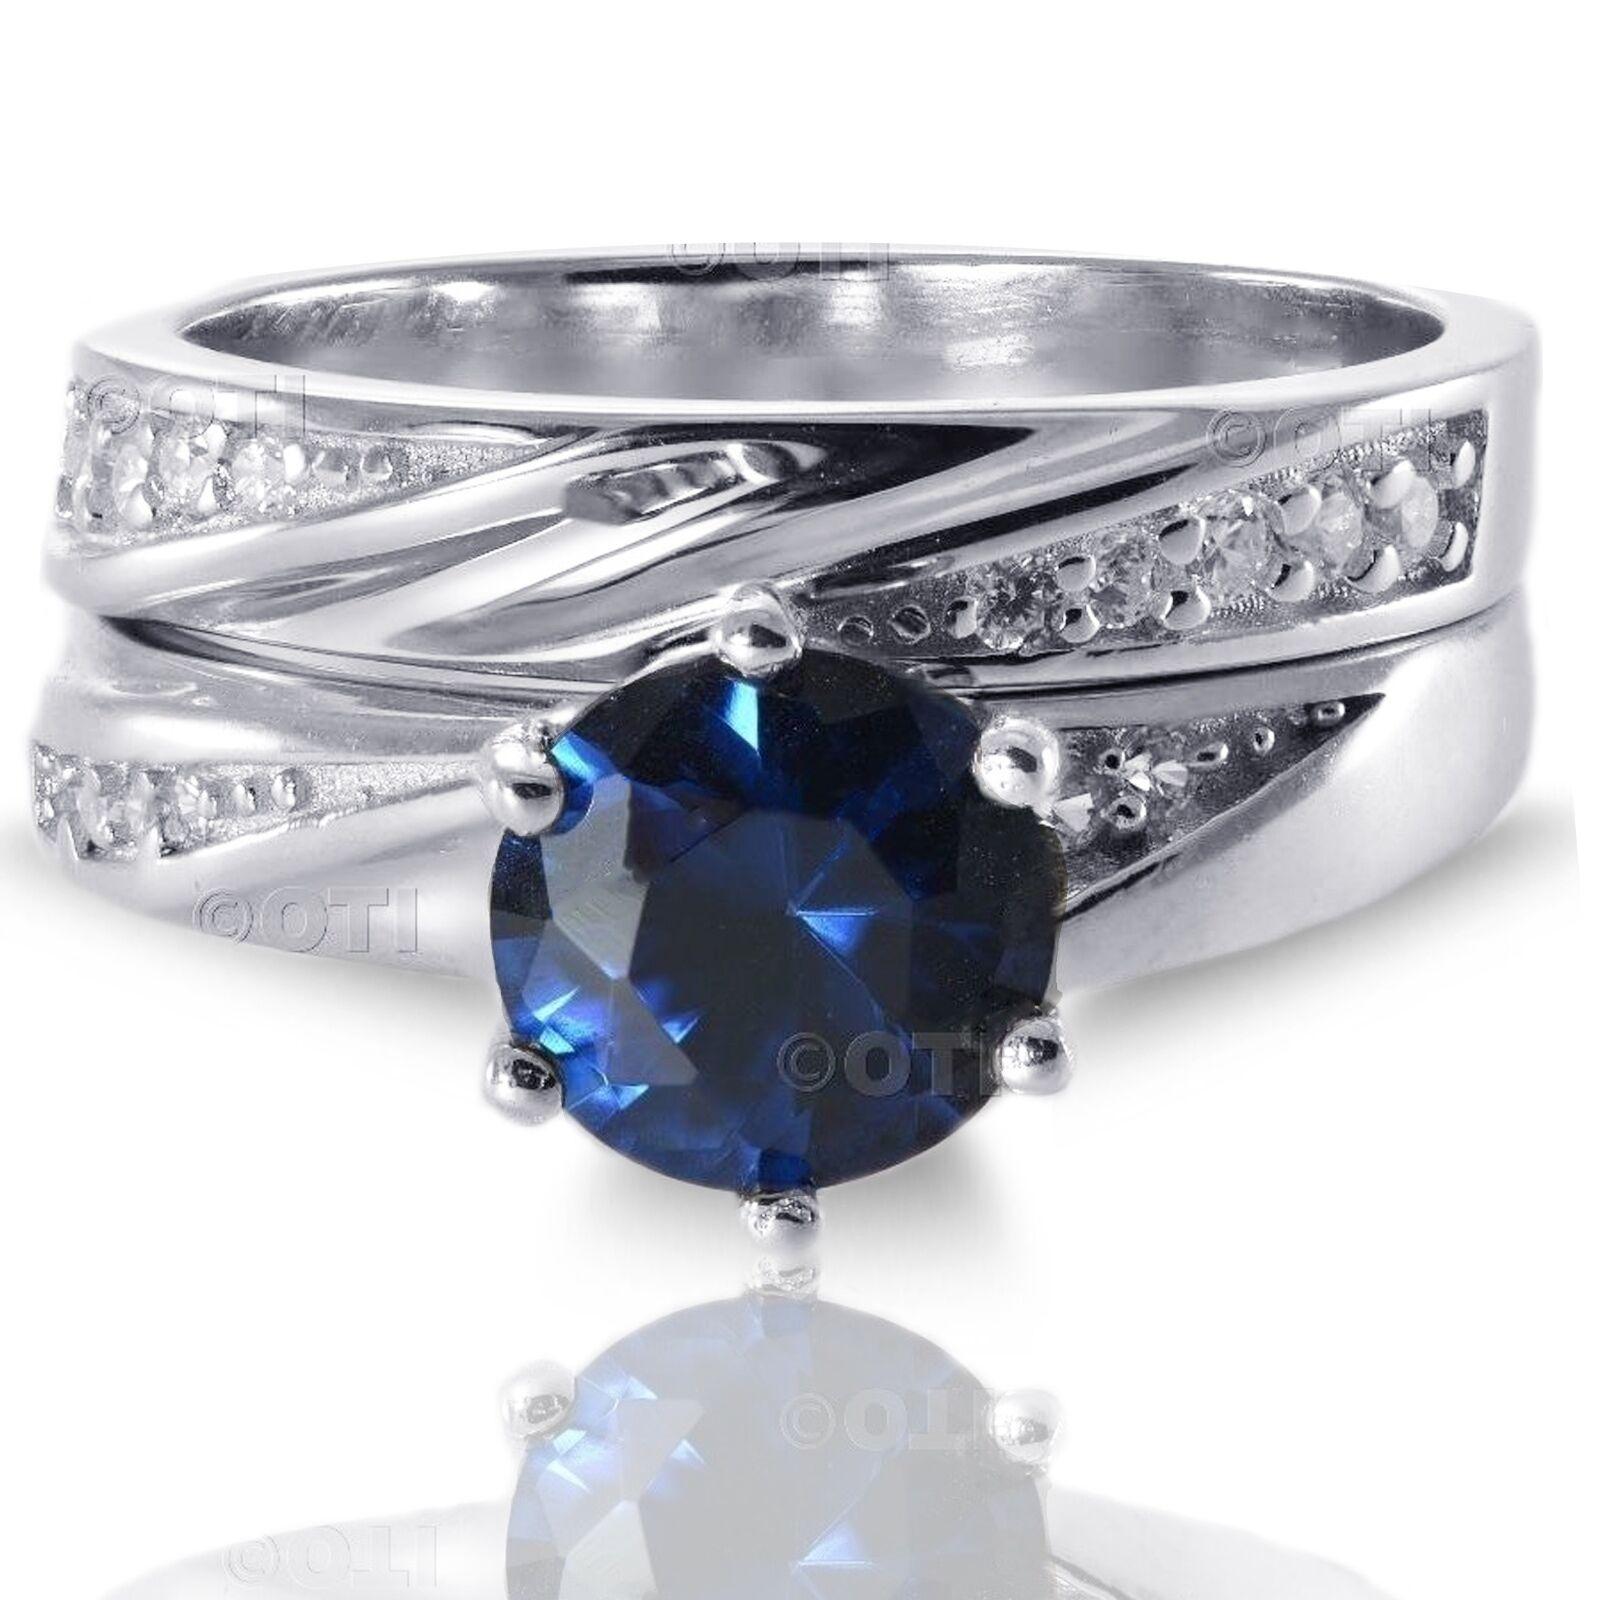 Zaffiro Blu Sfavillanti rossoondo rossoondo rossoondo Fidanzamento Anello argentoo Sterling Set 2.35 653084